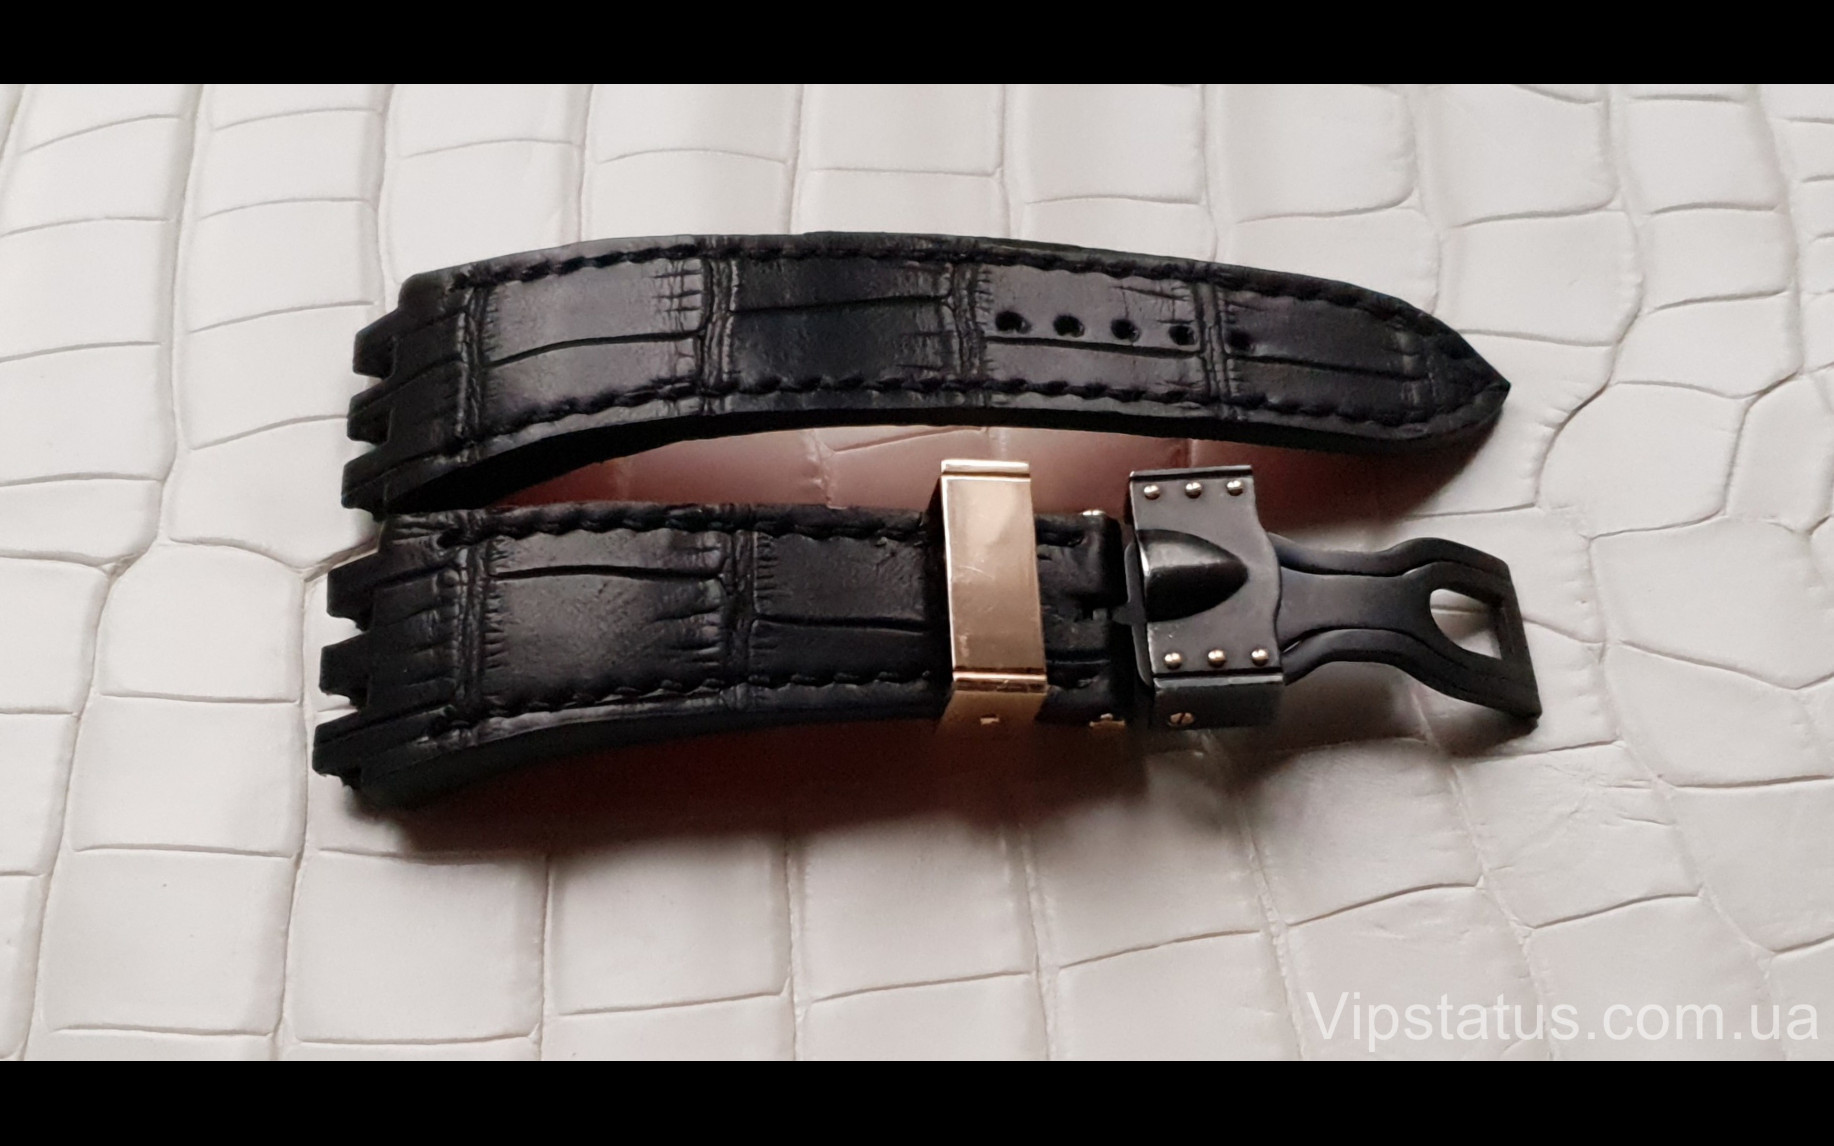 Elite Эксклюзивный ремешок для часов Maranello V8 кожа крокодила Exclusive Crocodile Strap for Maranello V8 watches image 2